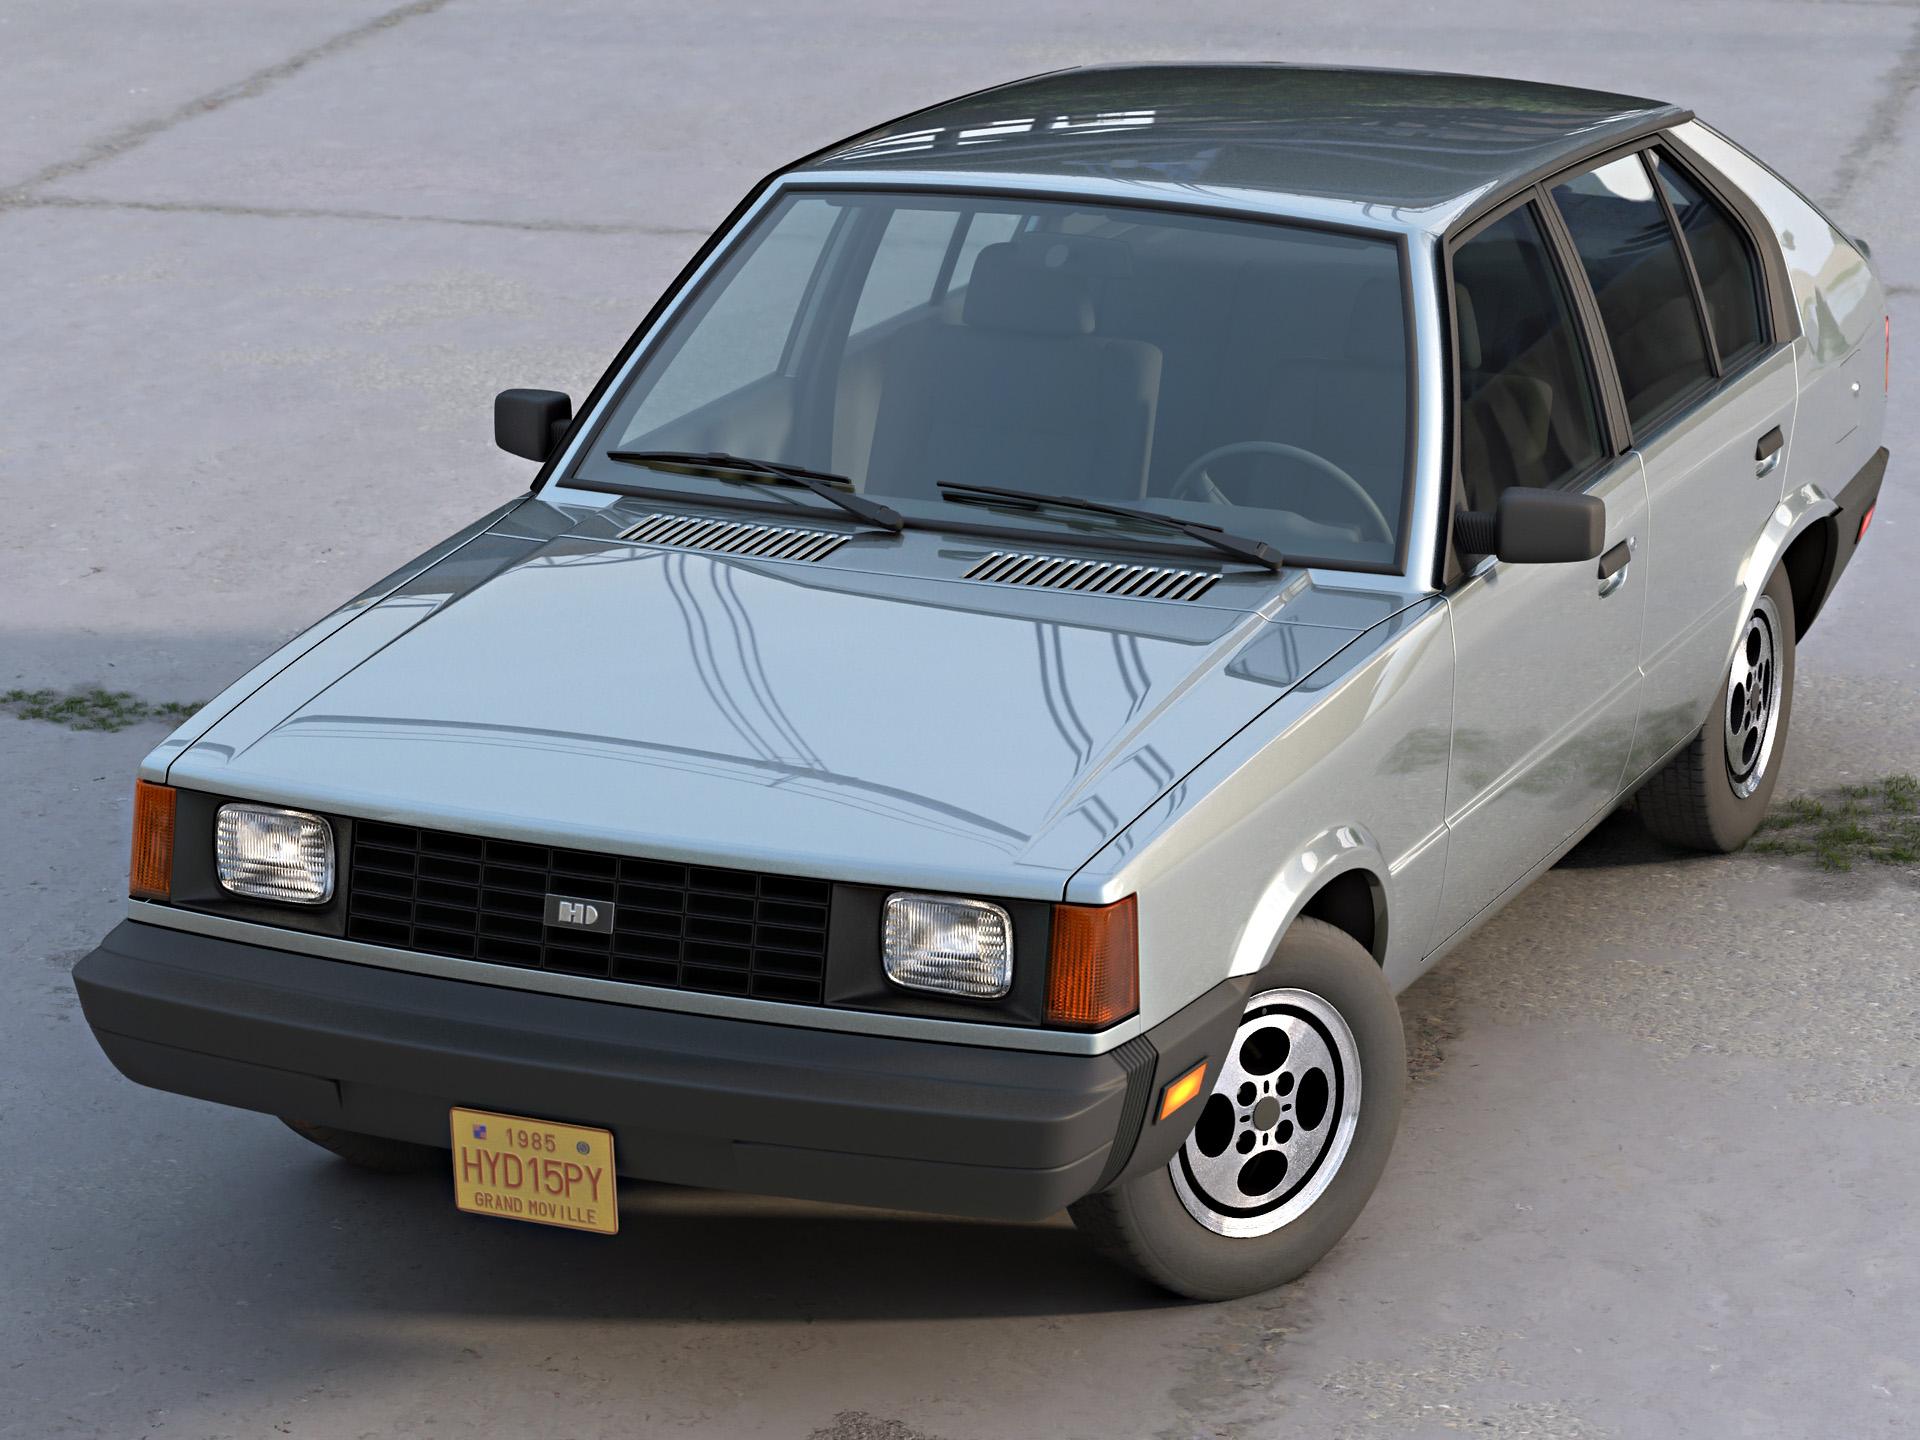 Hyundai Pony Canada 1985 3d model 3ds max fbx c4d dae obj 277760